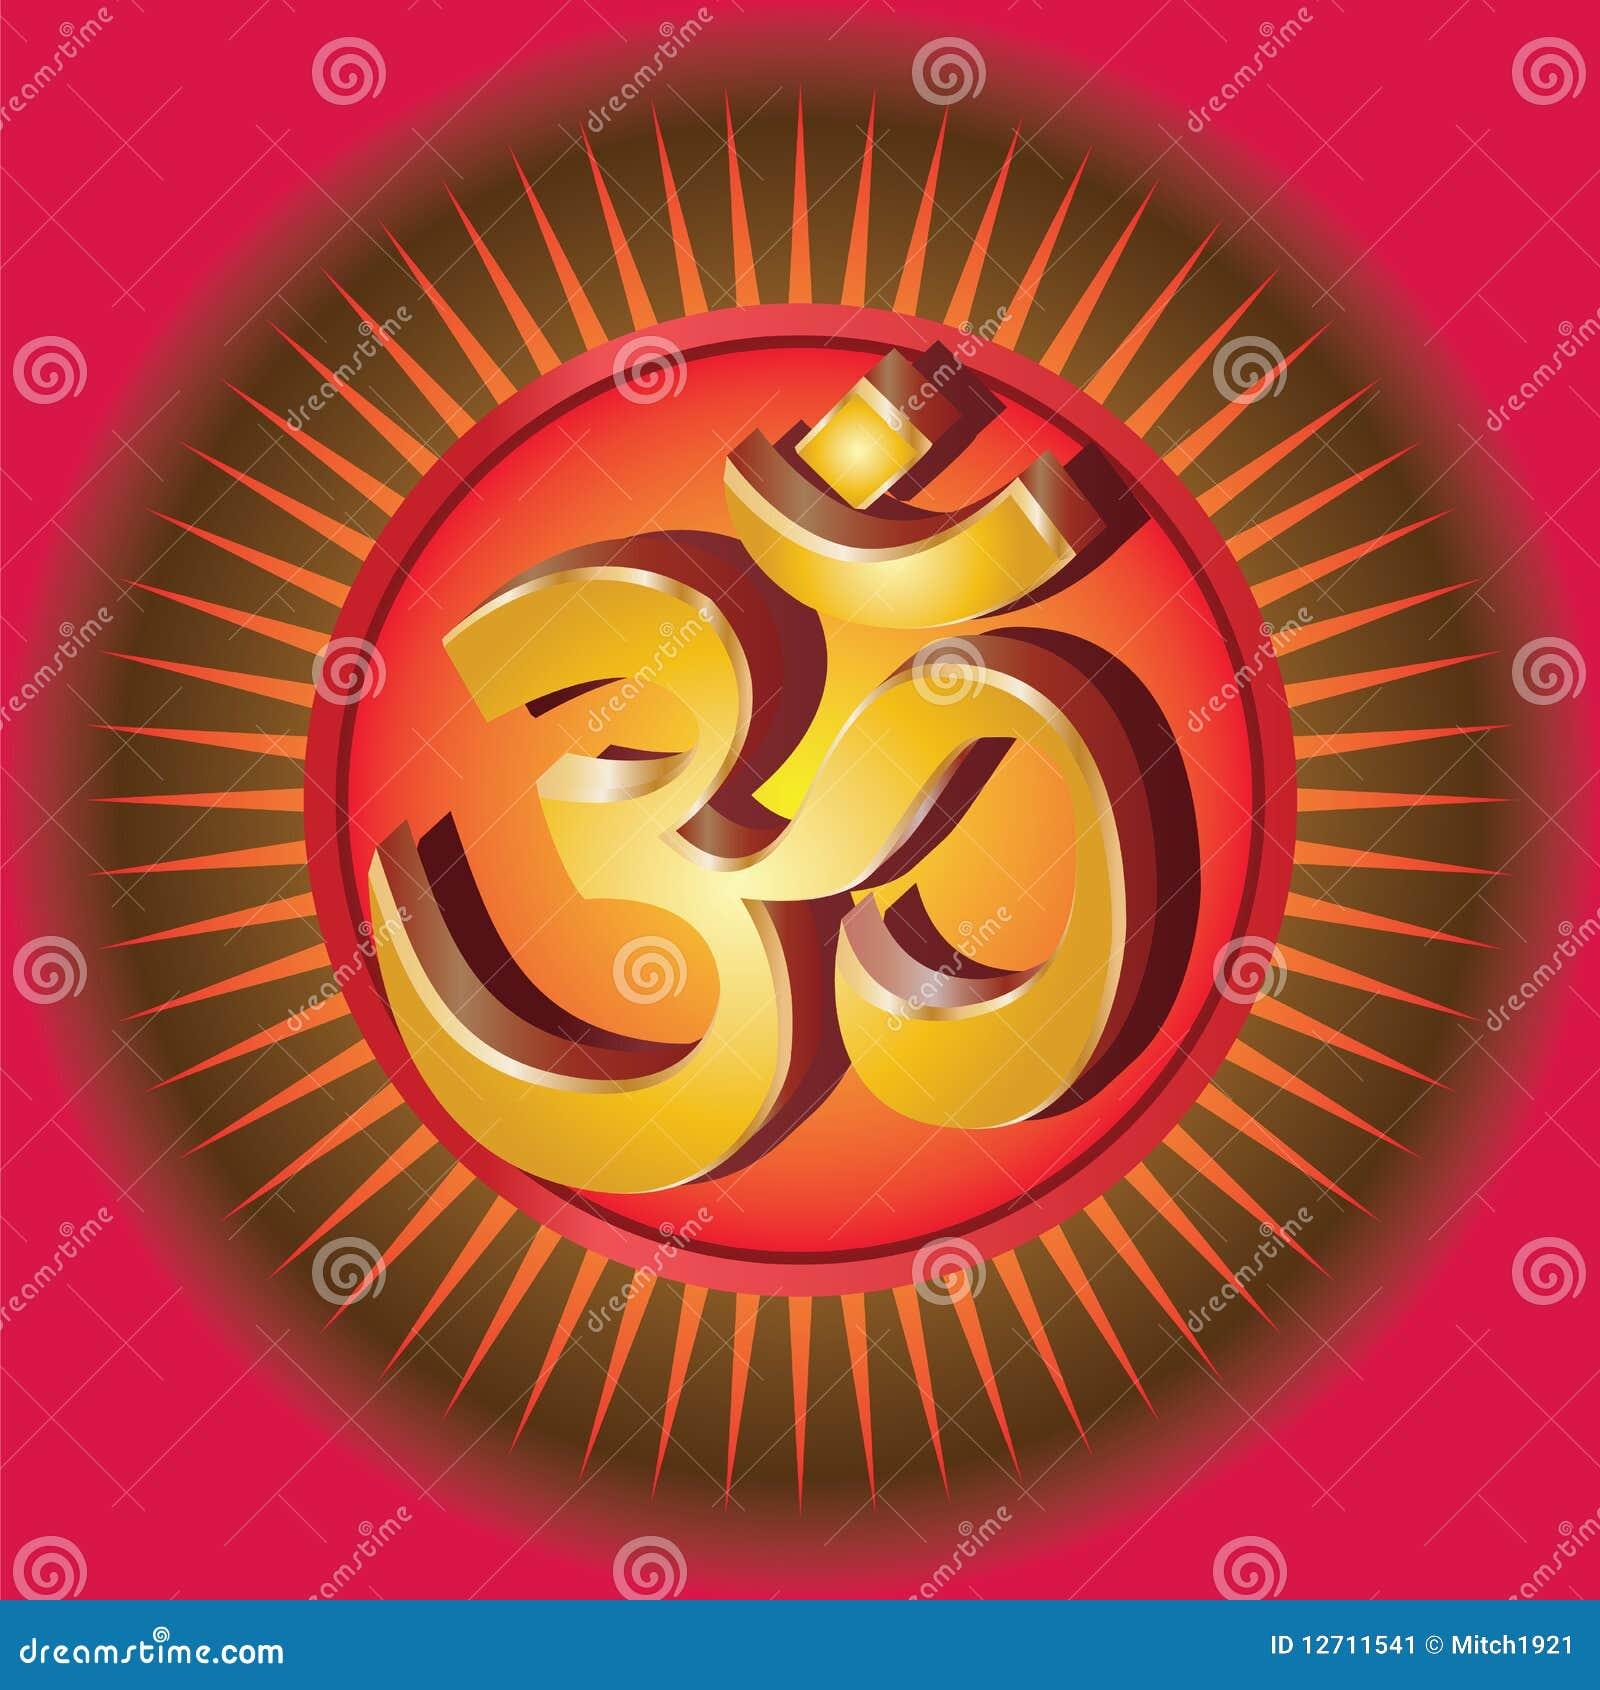 Vector om symbol stock vector image of oriental golden Om symbol images